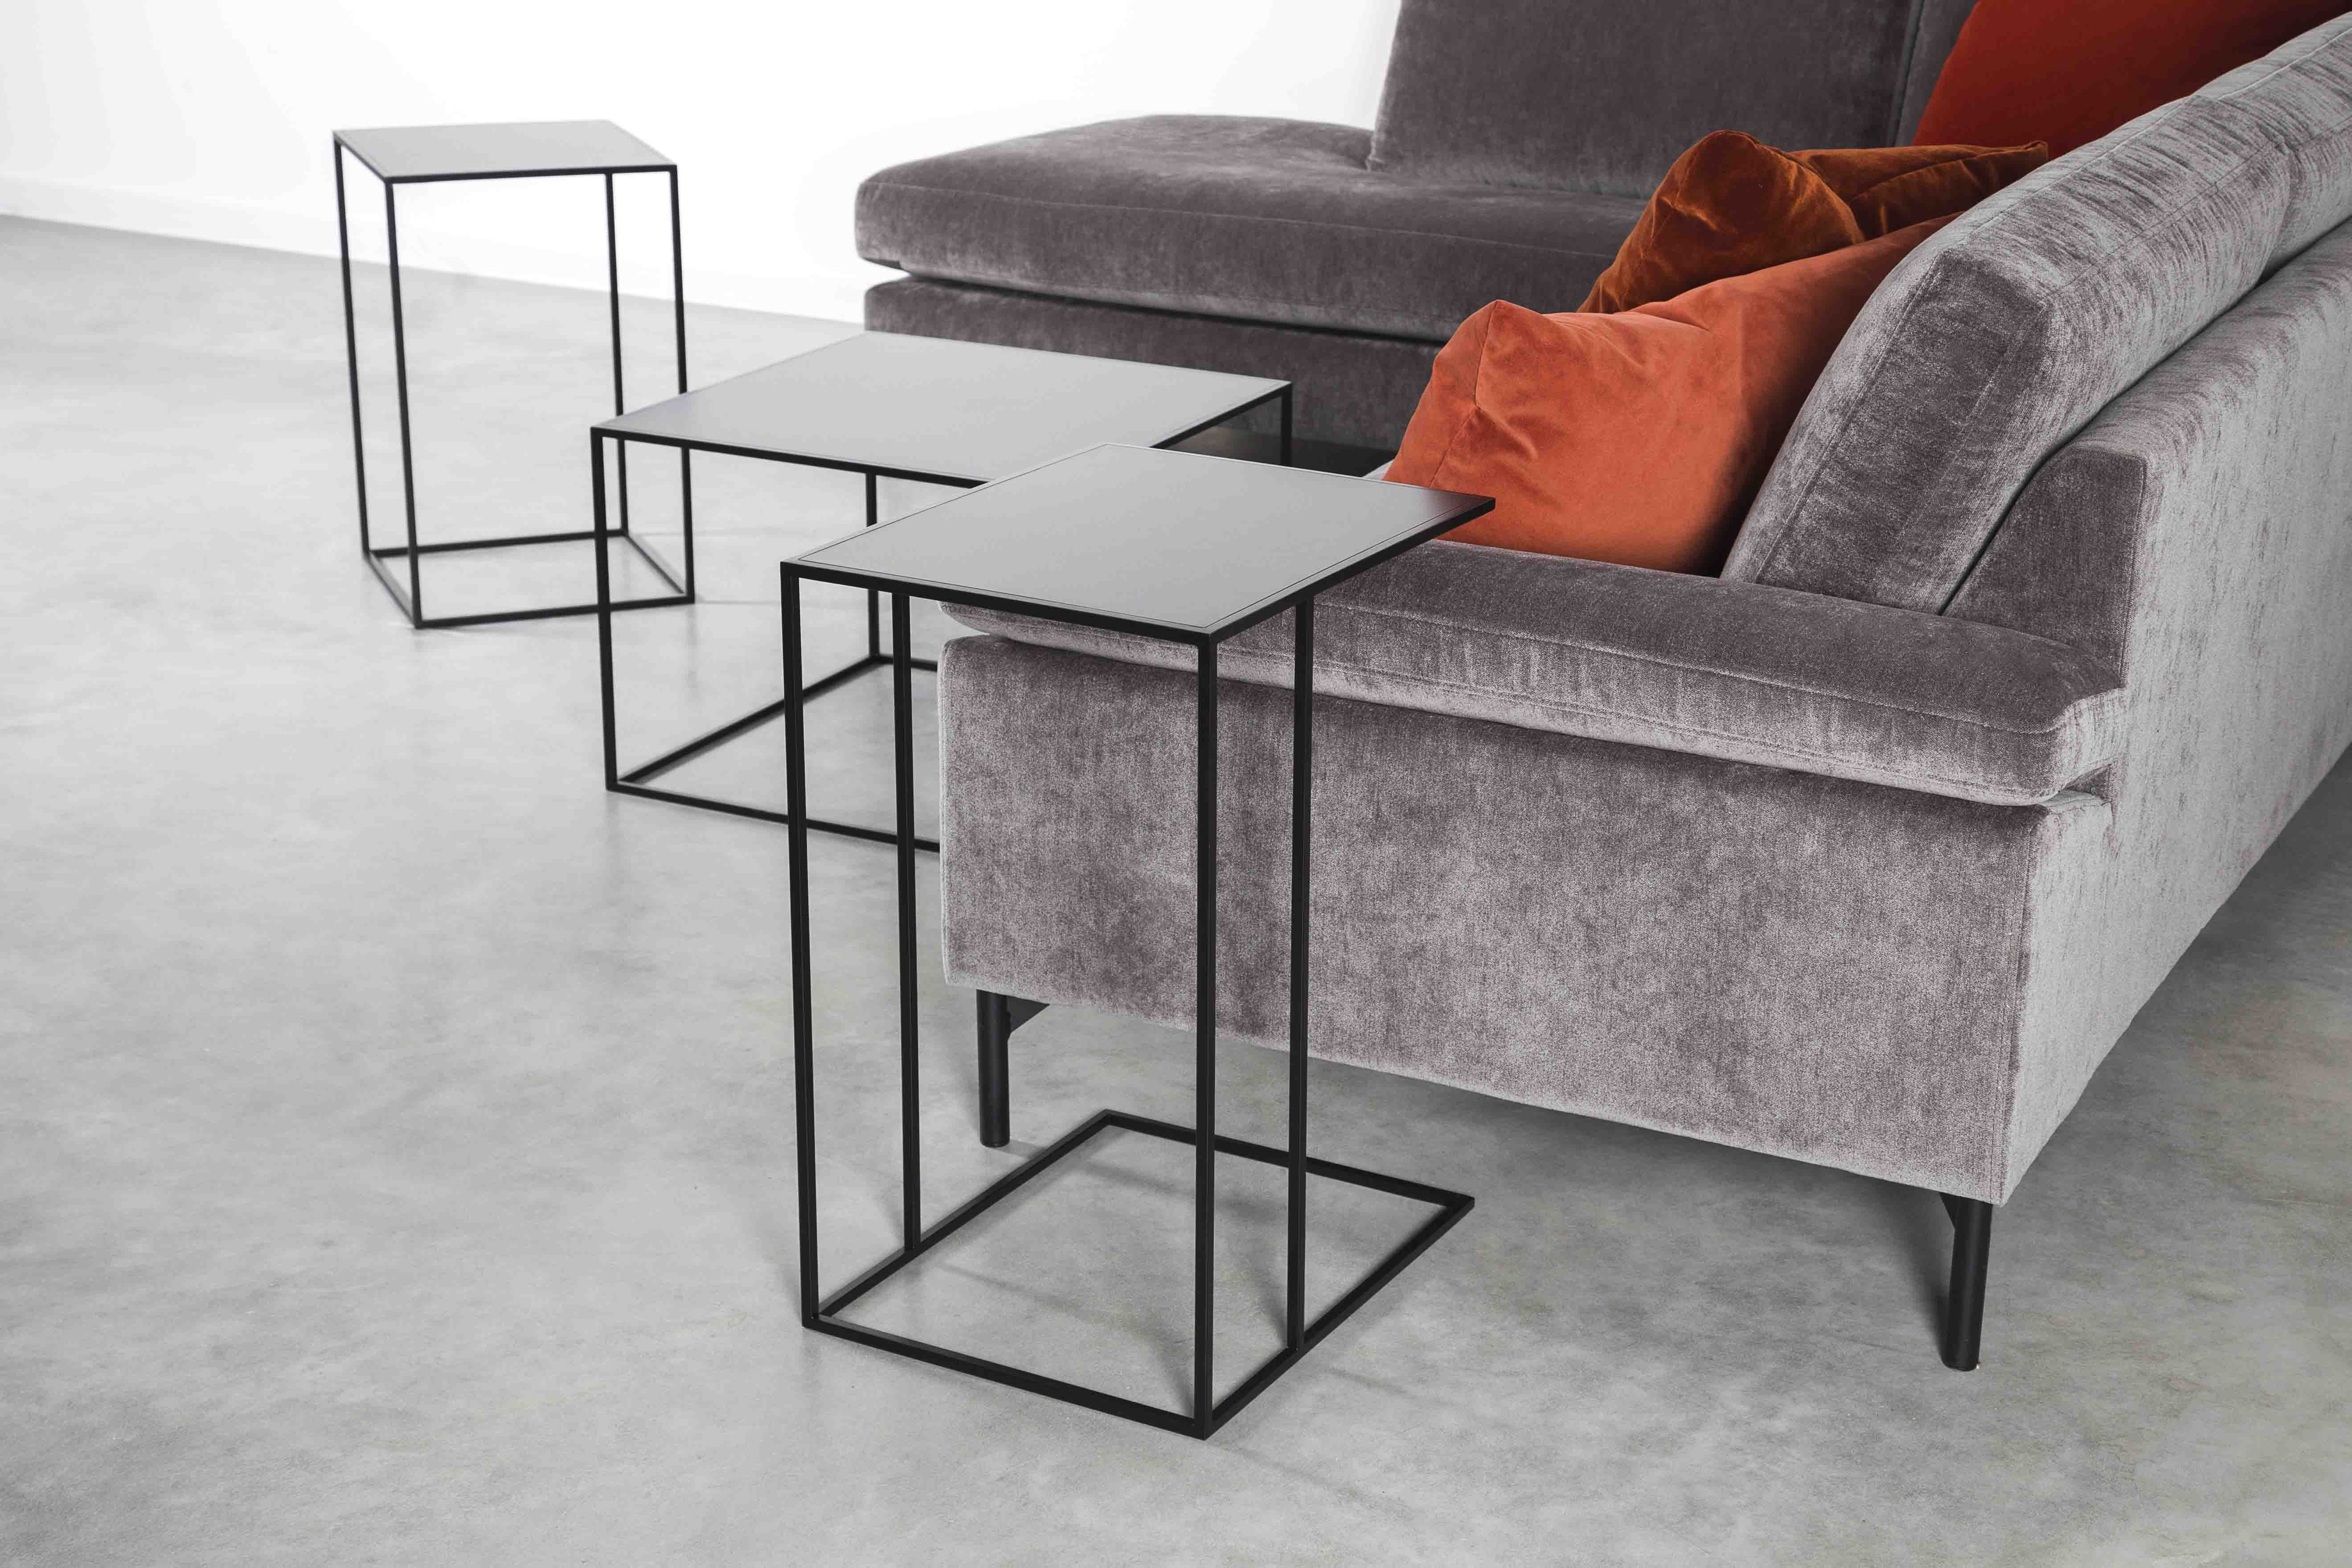 Marvelous Silence Sofa Side Table Sofa Side Table Elensen Com Inzonedesignstudio Interior Chair Design Inzonedesignstudiocom